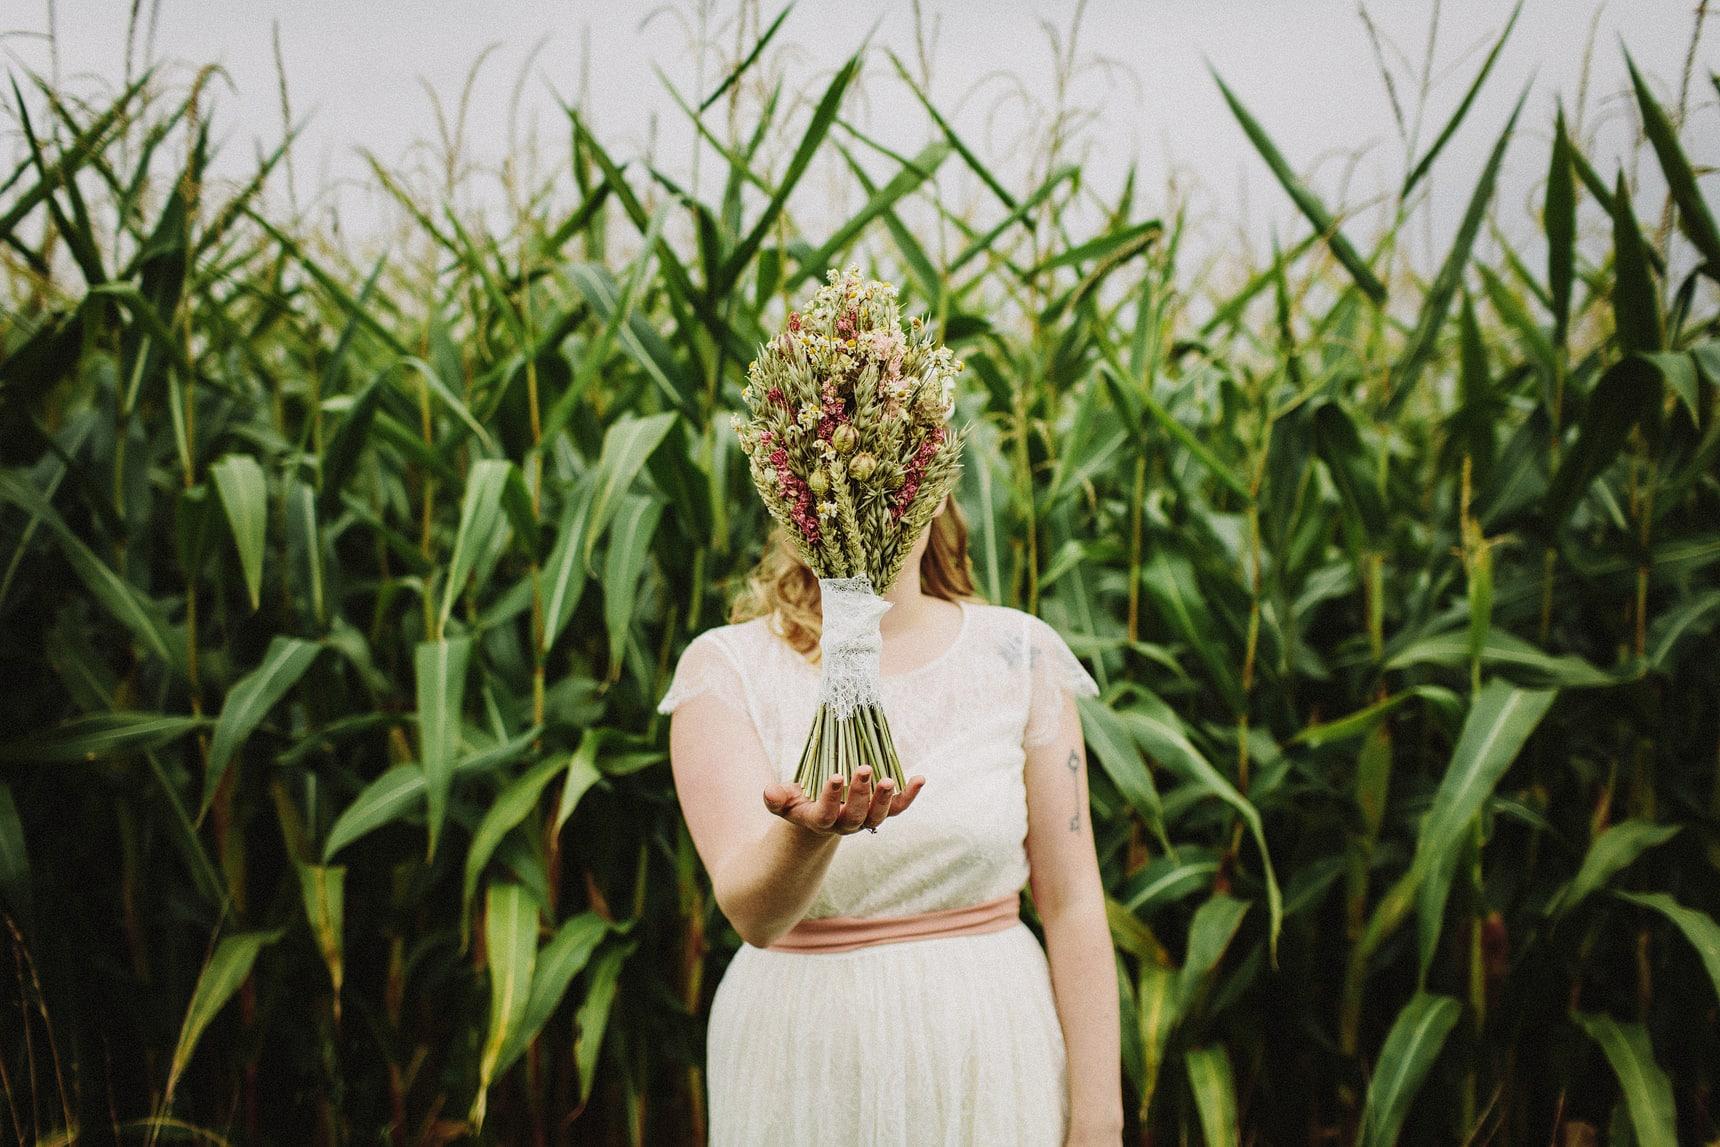 creative wedding portraits in england